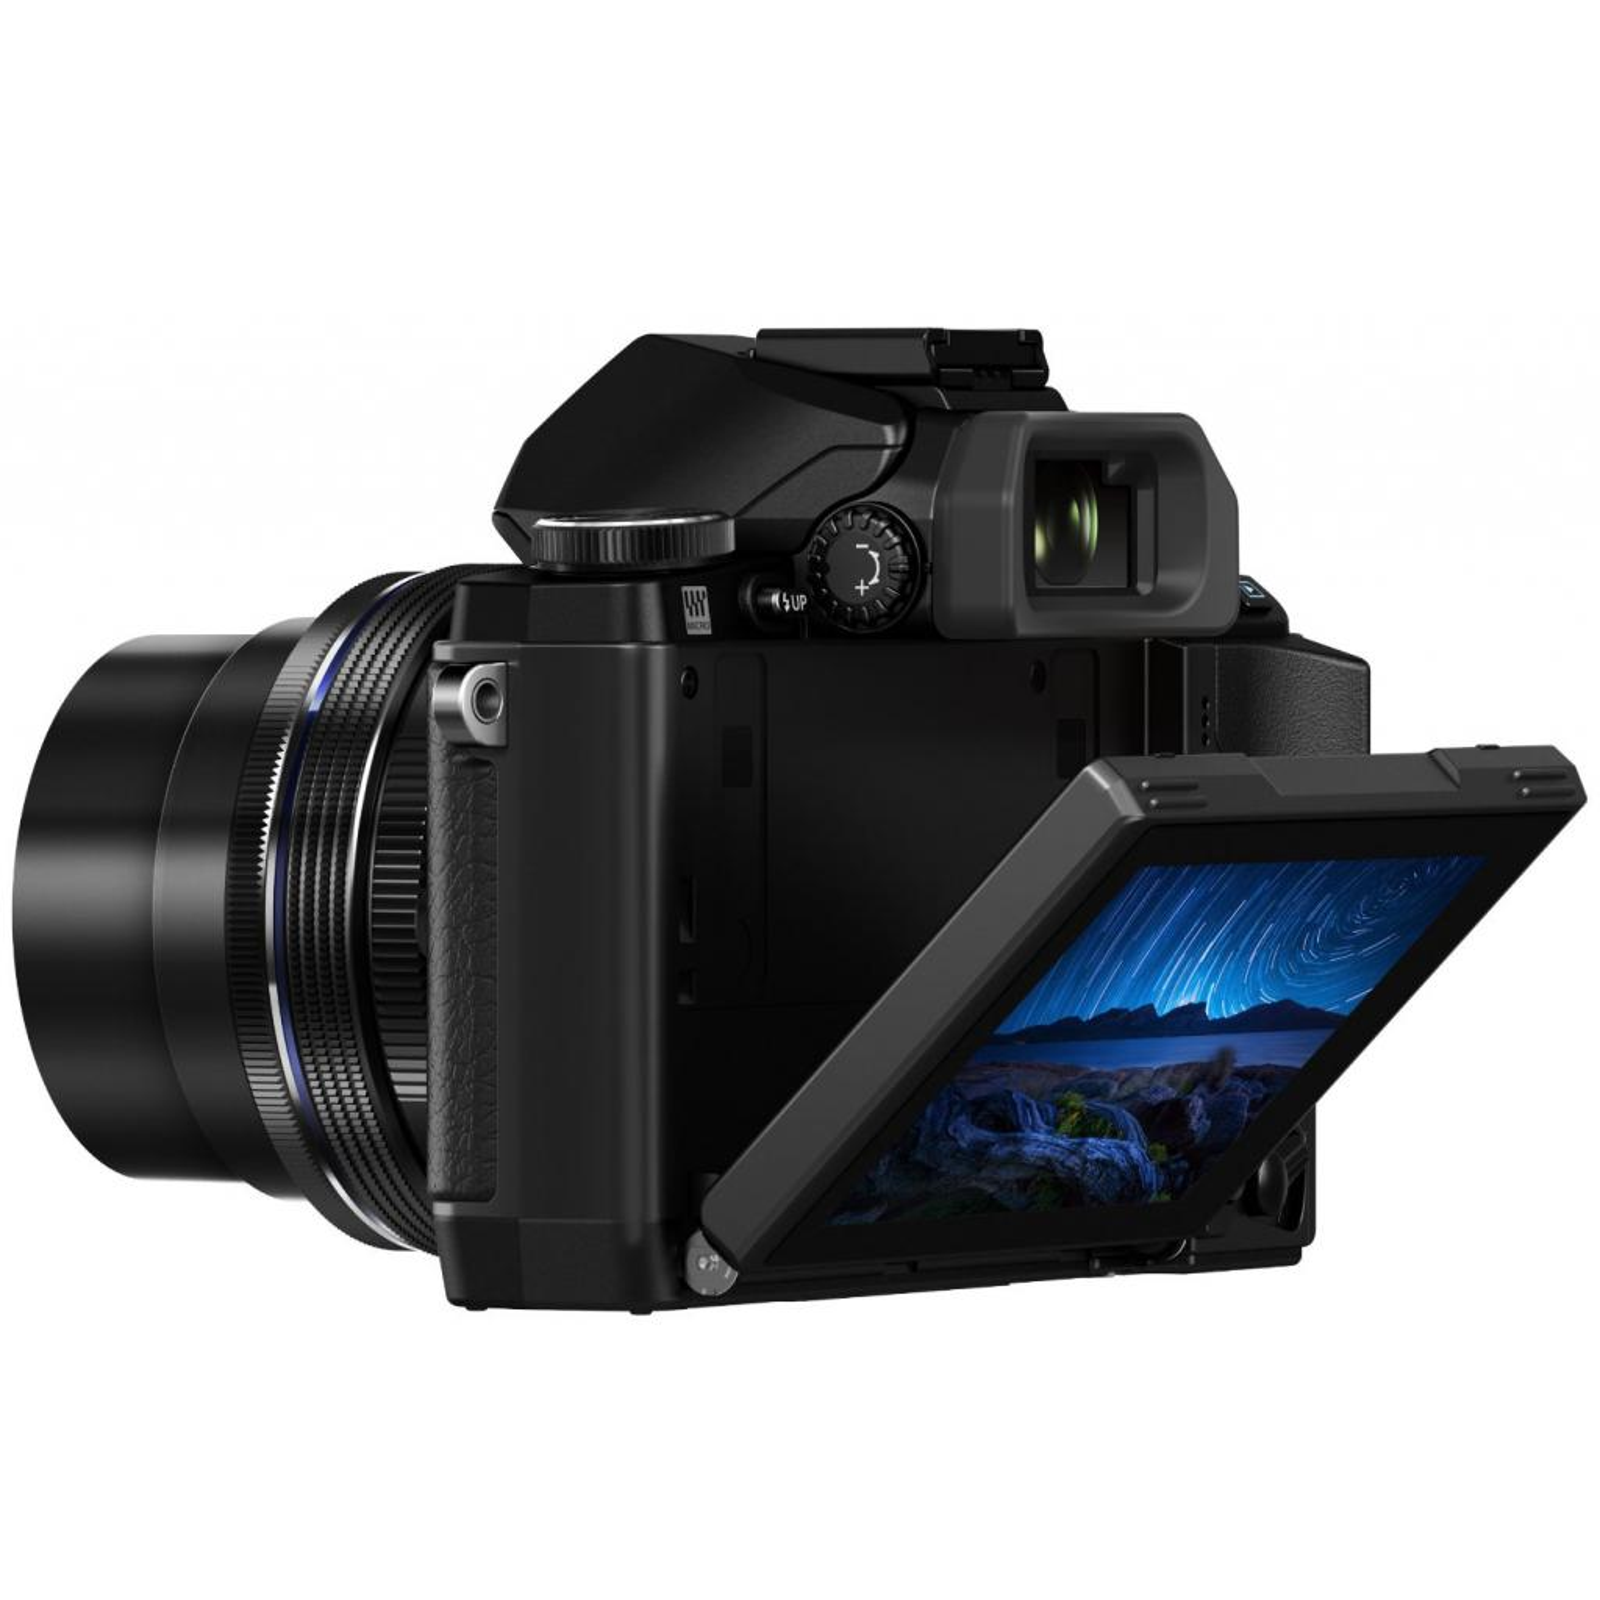 Цифровой фотоаппарат OLYMPUS E-M10 pancake zoom 14-42 Kit black/black (V207023BE000) изображение 4